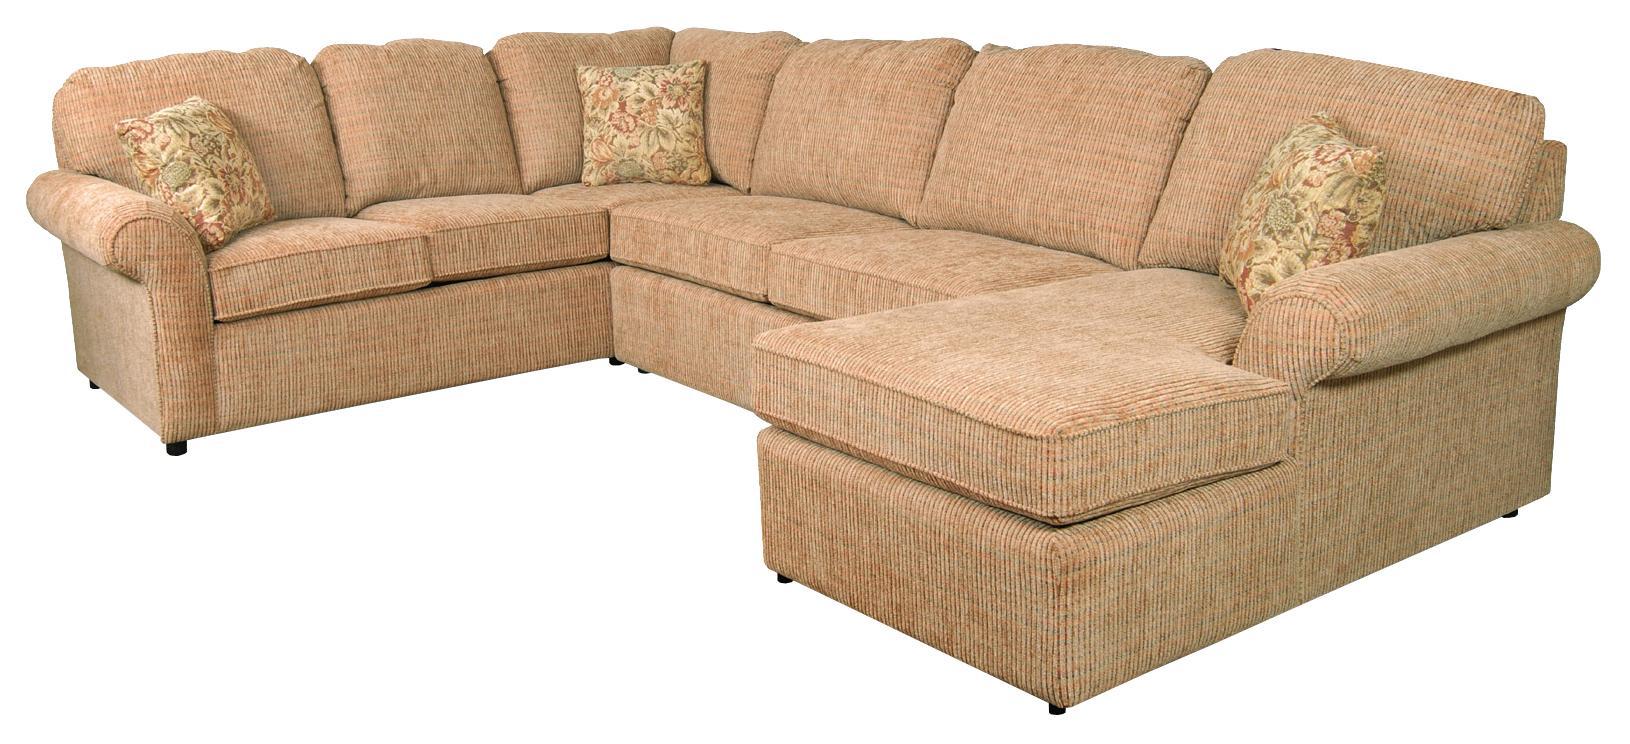 England Malibu 5-6 Seat (right side) Chaise Sectional Sofa ...